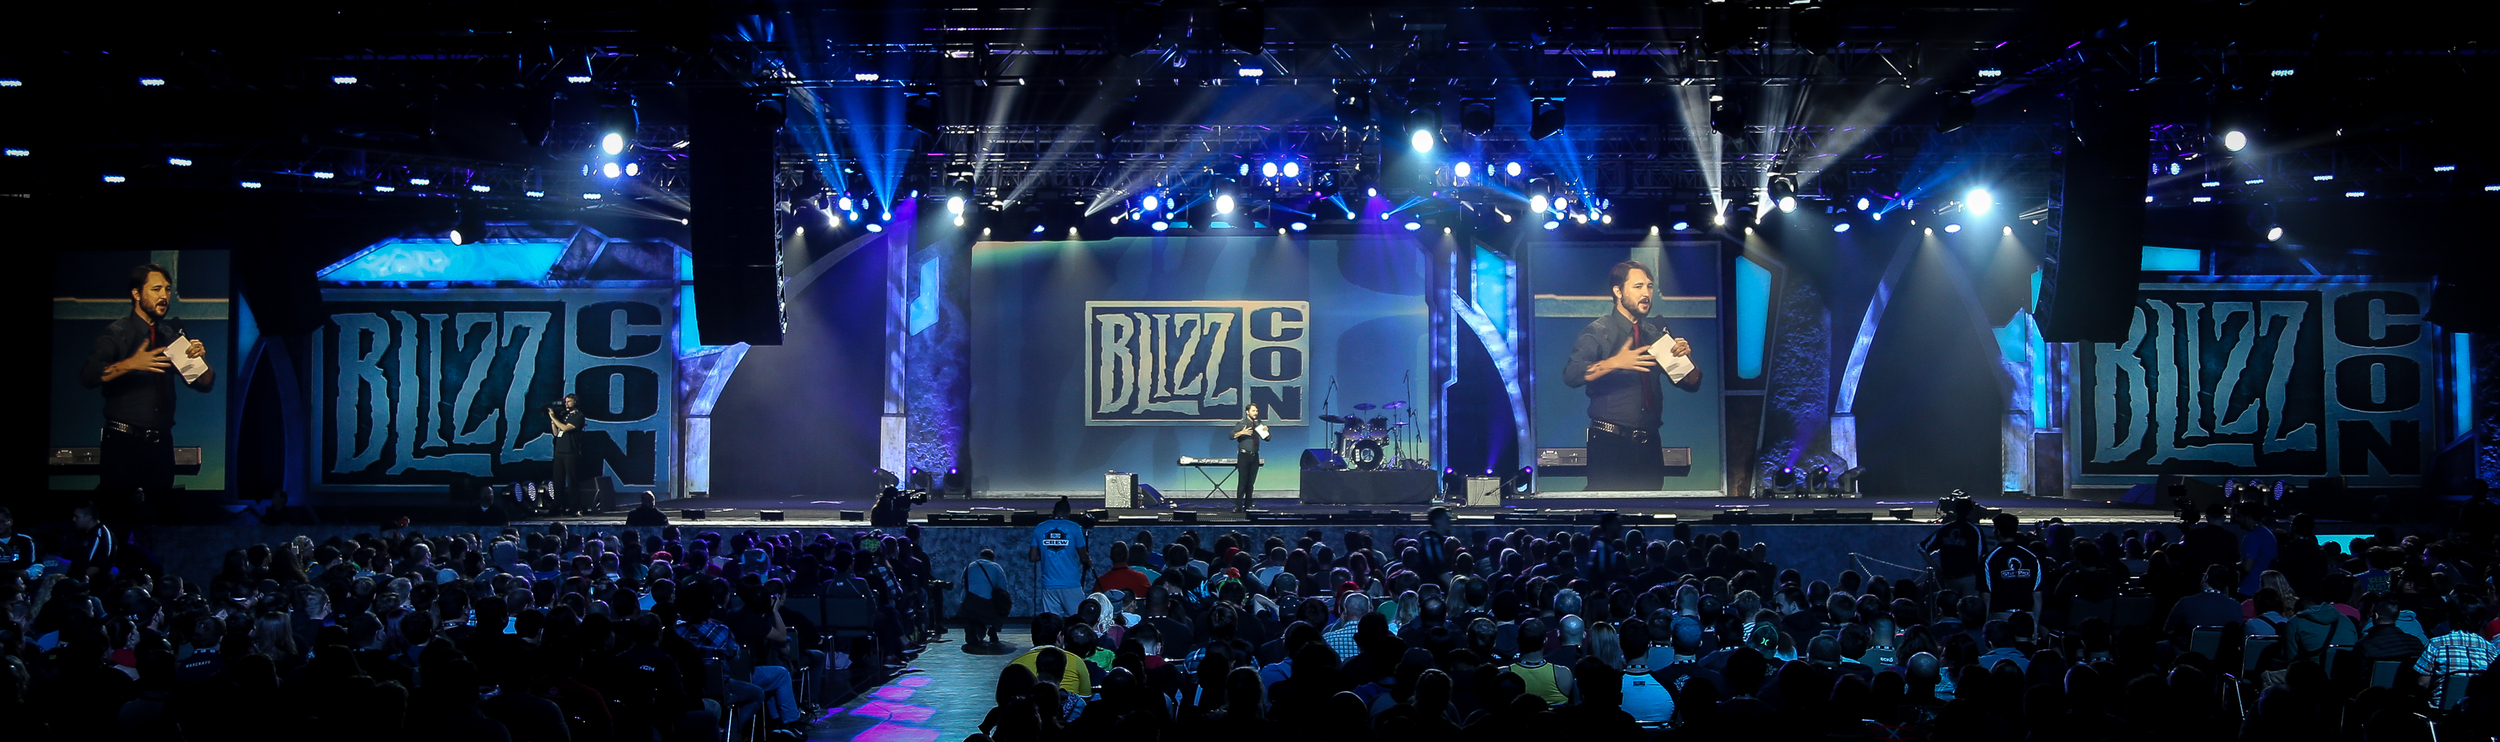 Blizzcon 2015 (3 of 5).jpg